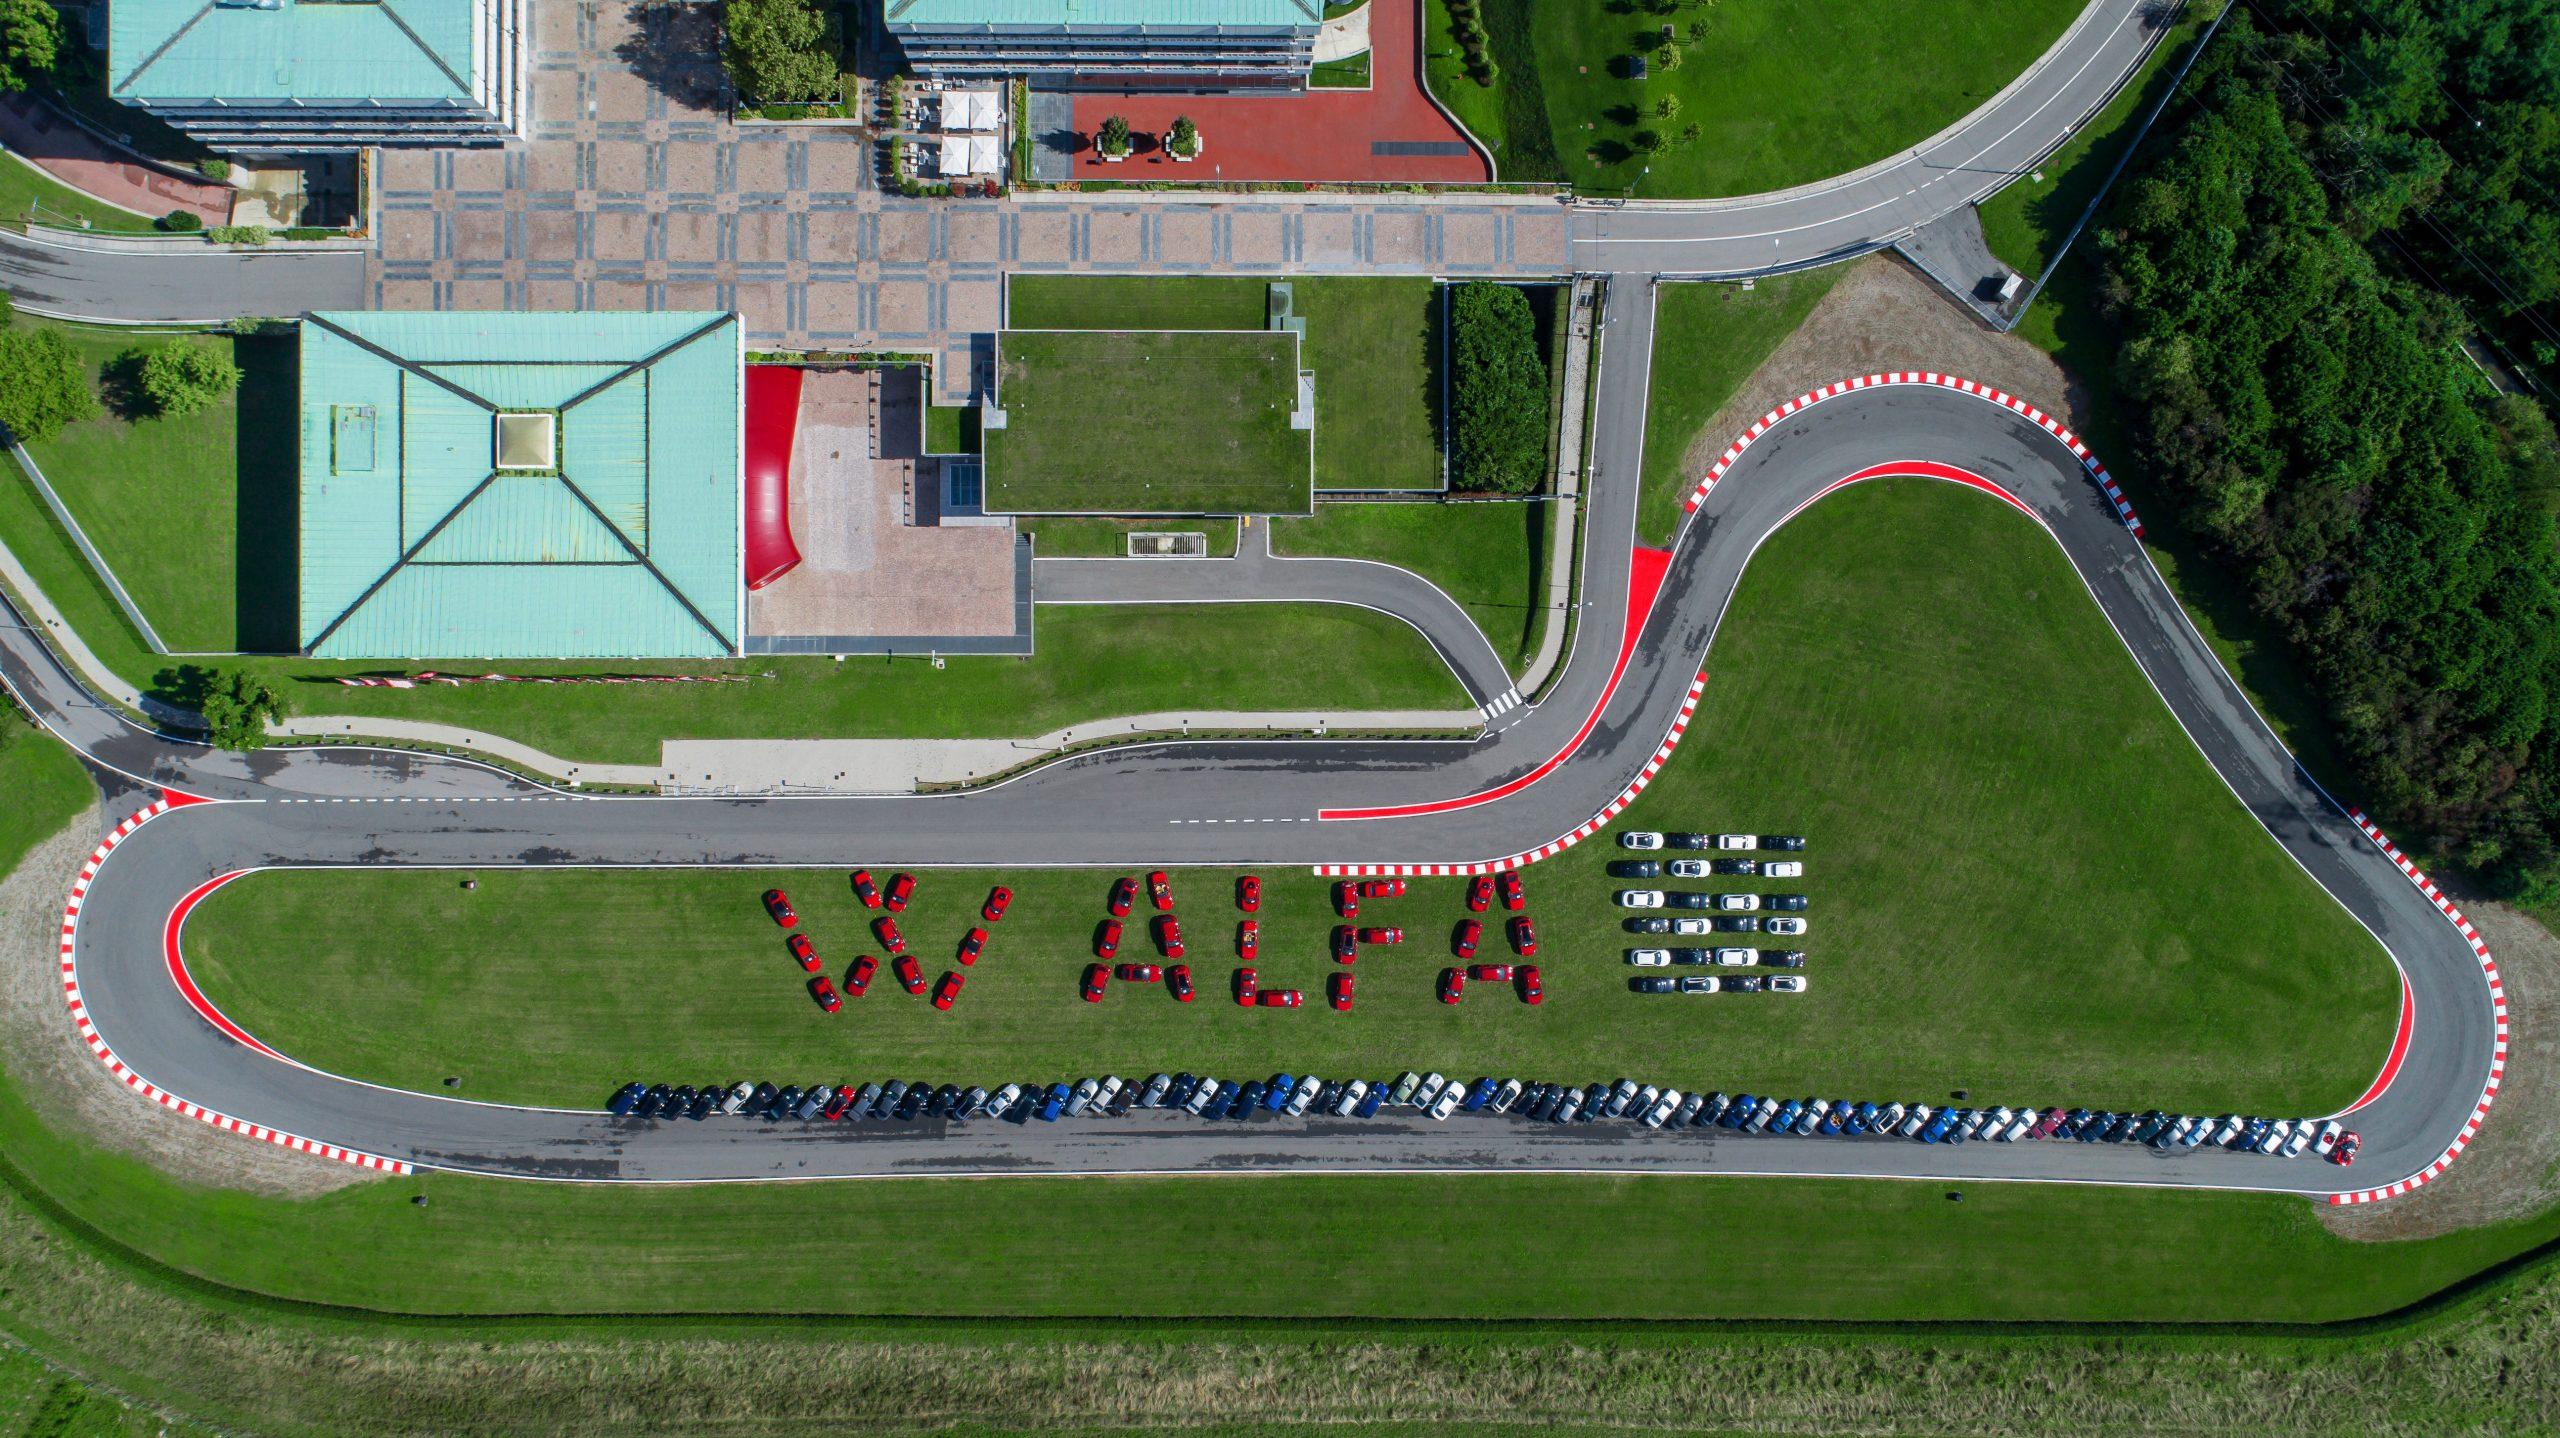 210610 AR 111 Anniversary HP scaled H Alfa Romeo προσκαλεί τους Alfisti για τα 111α γενέθλια της Alfa, alfa romeo, Alfa Romeo Giulia, Alfa Romeo Giulia GTA, Alfa Romeo Giulia GTAm, ειδήσεις, Νέα